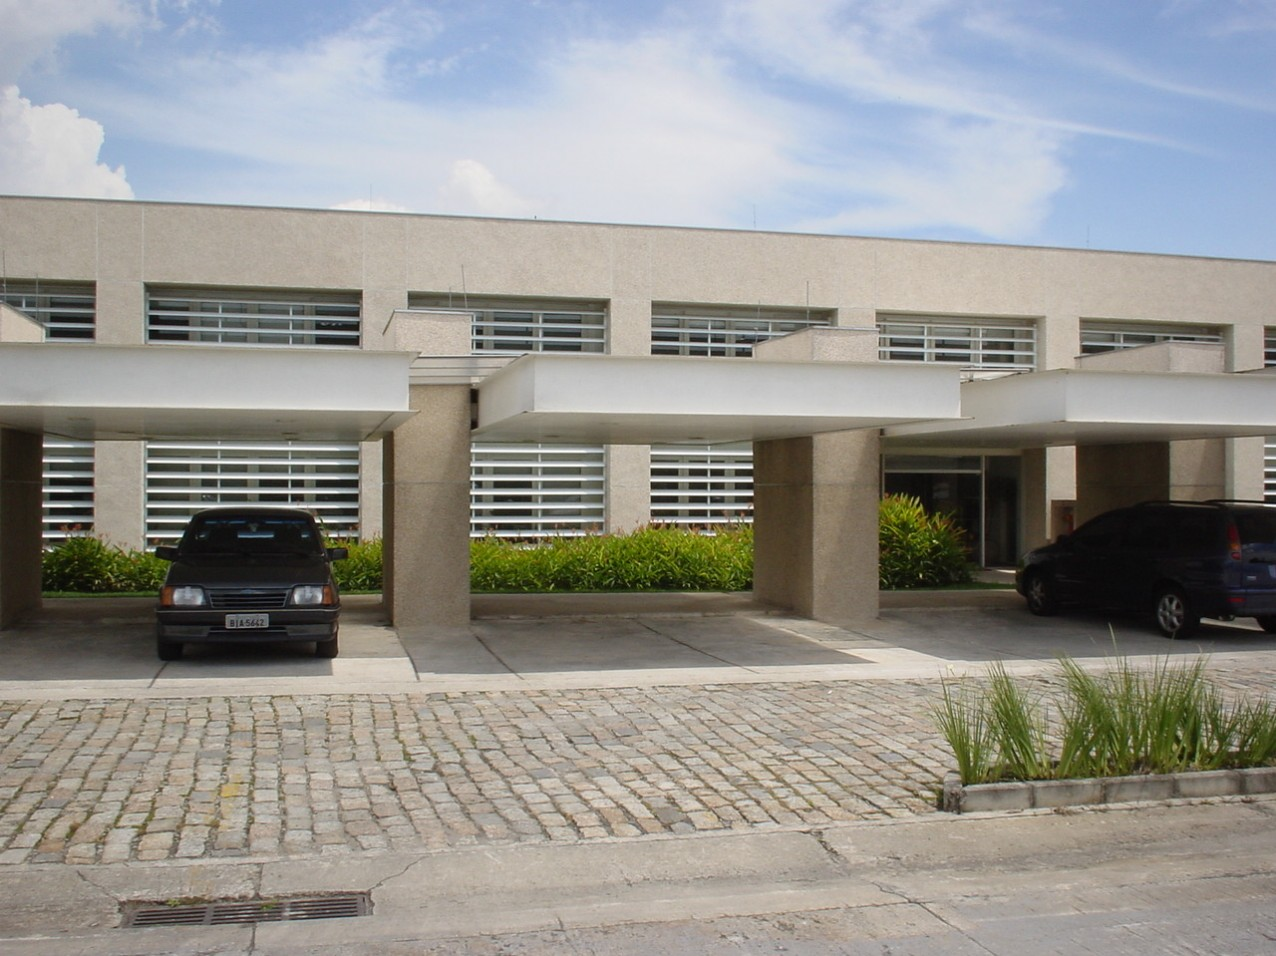 Obra industrial Durr do Brasil - Fachada